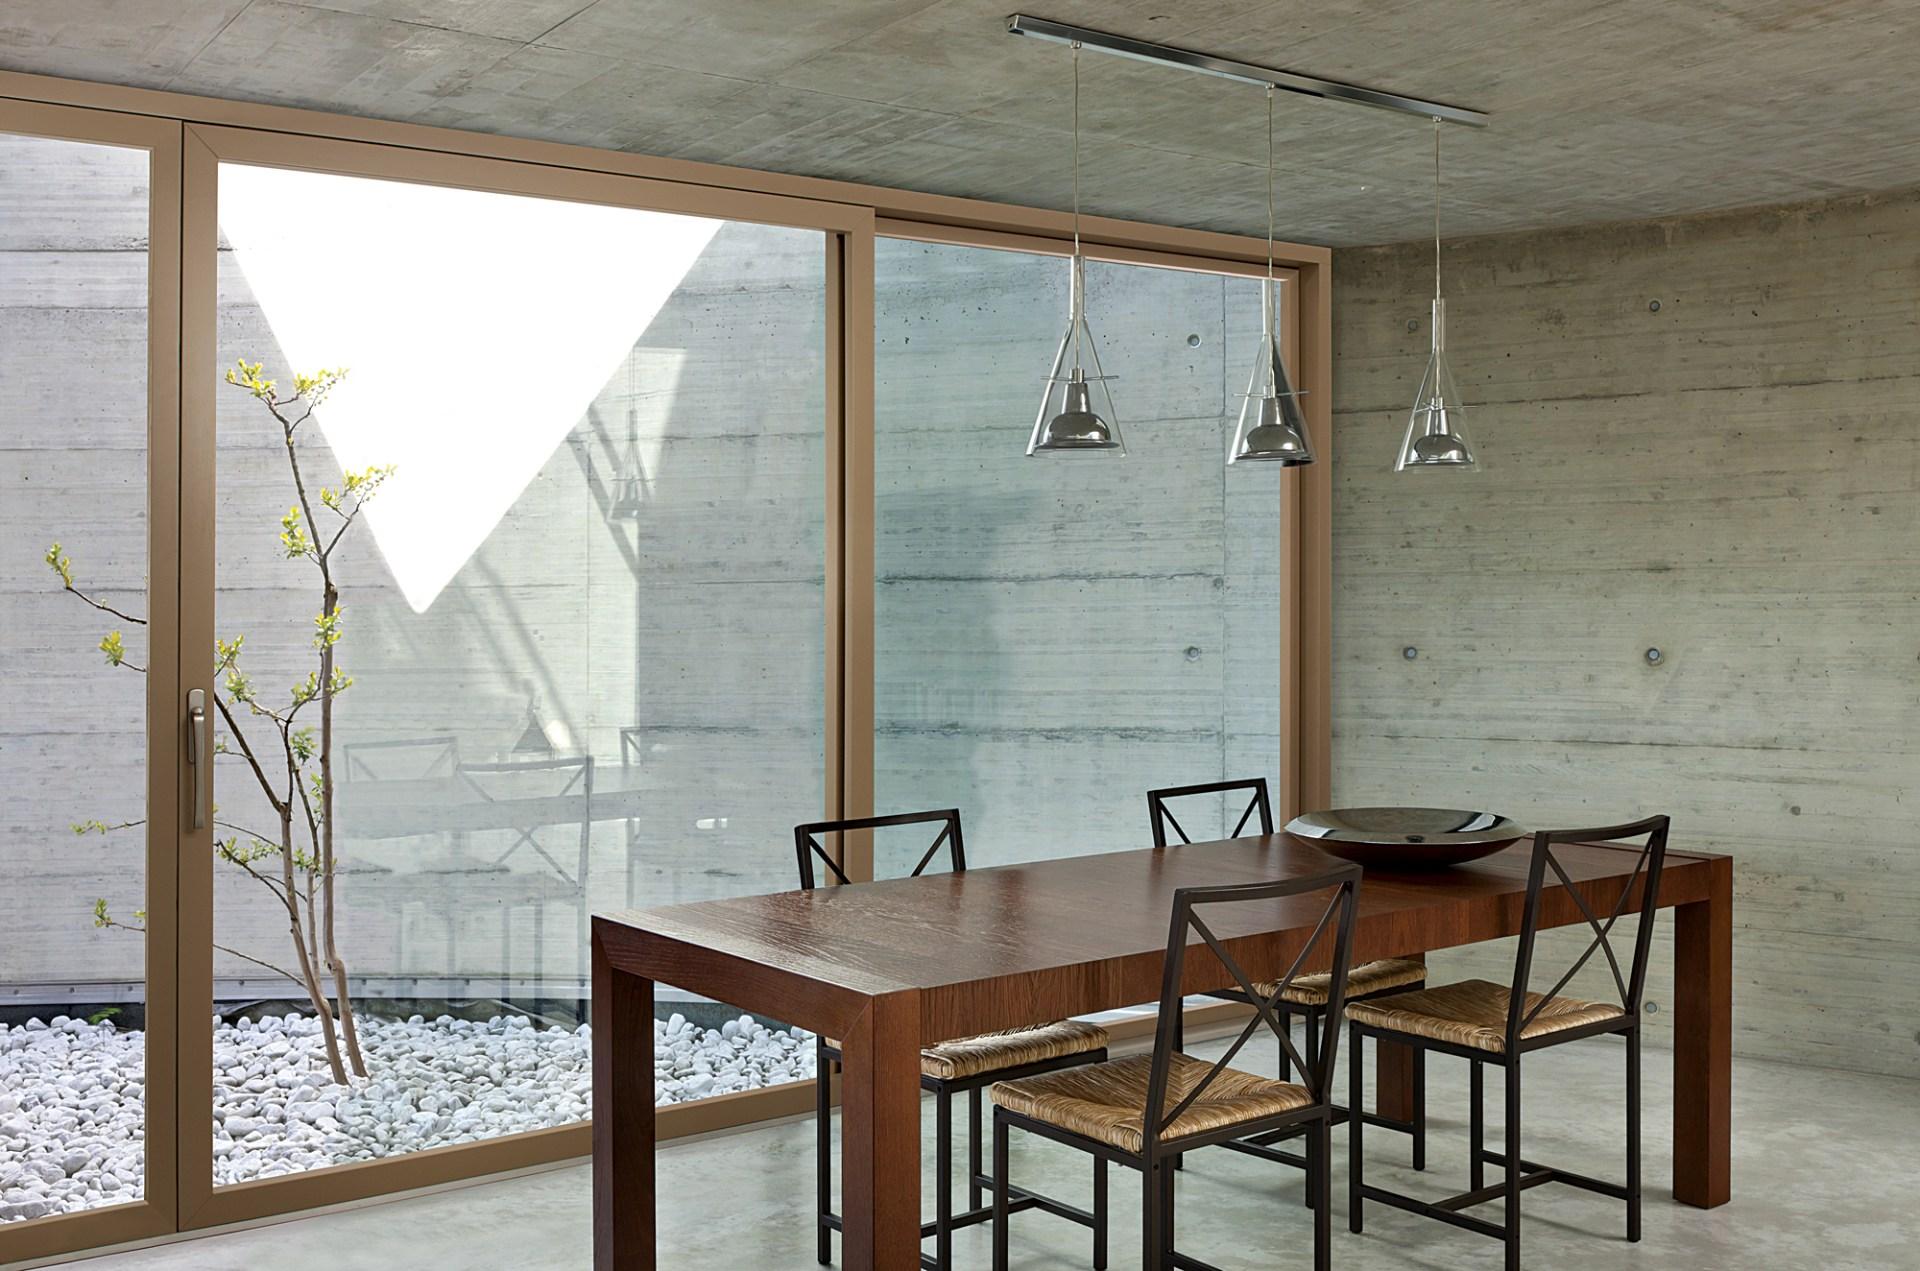 Eterno aluminium timber composite windows minimalist frame extra large sliding balcony door to garden